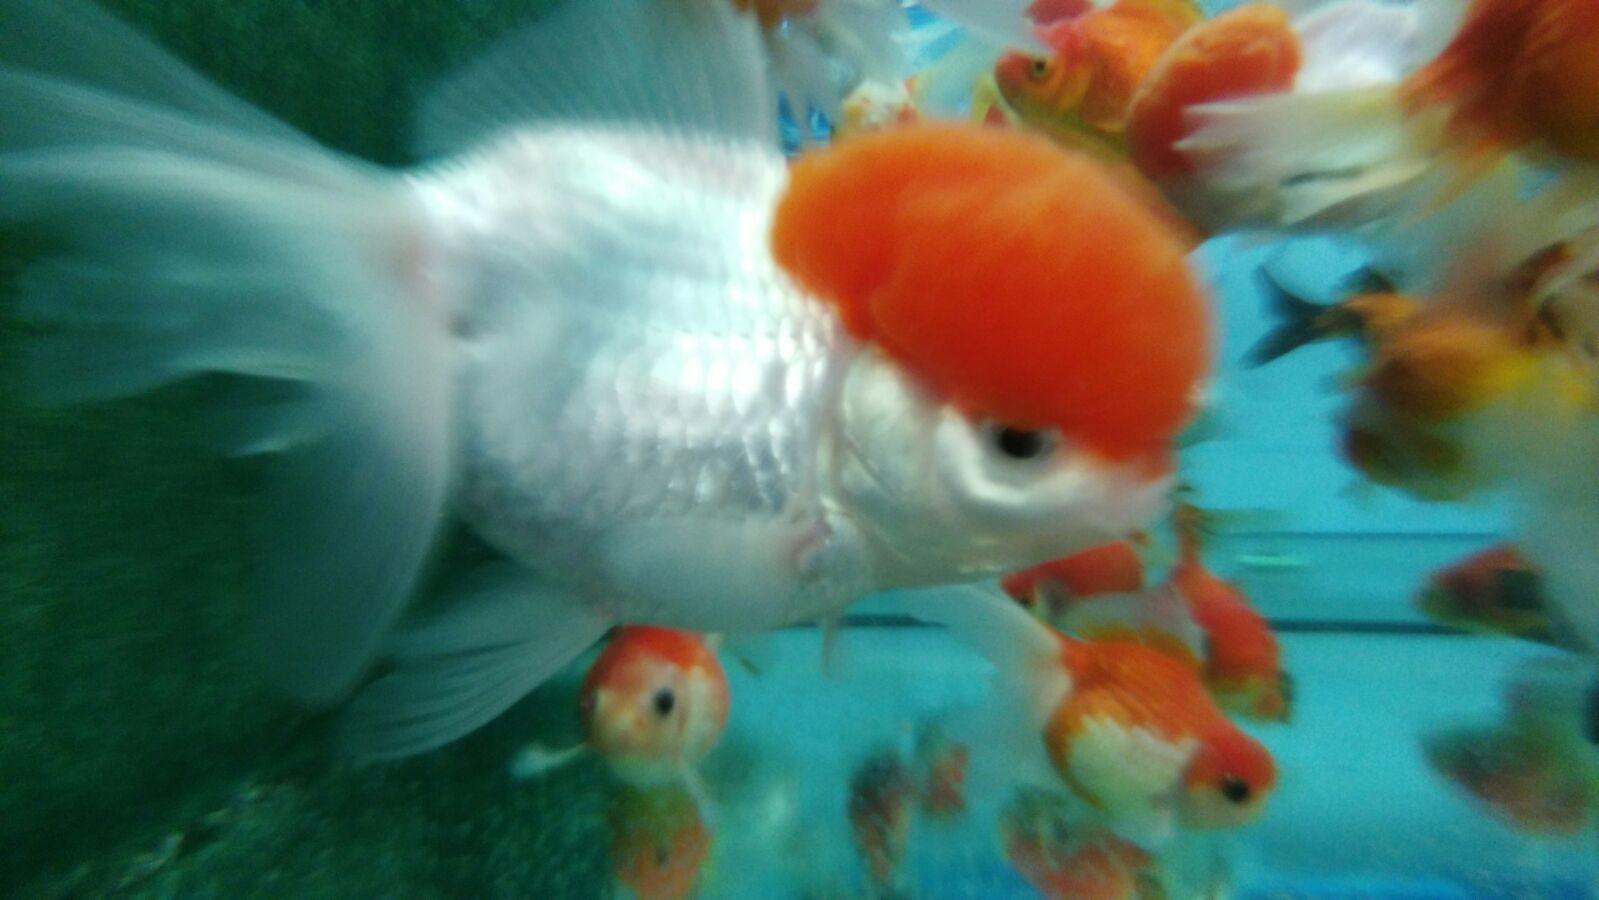 boina-roja-red-cap-goldfish-calidad-carassius-auratus- ec338b23181